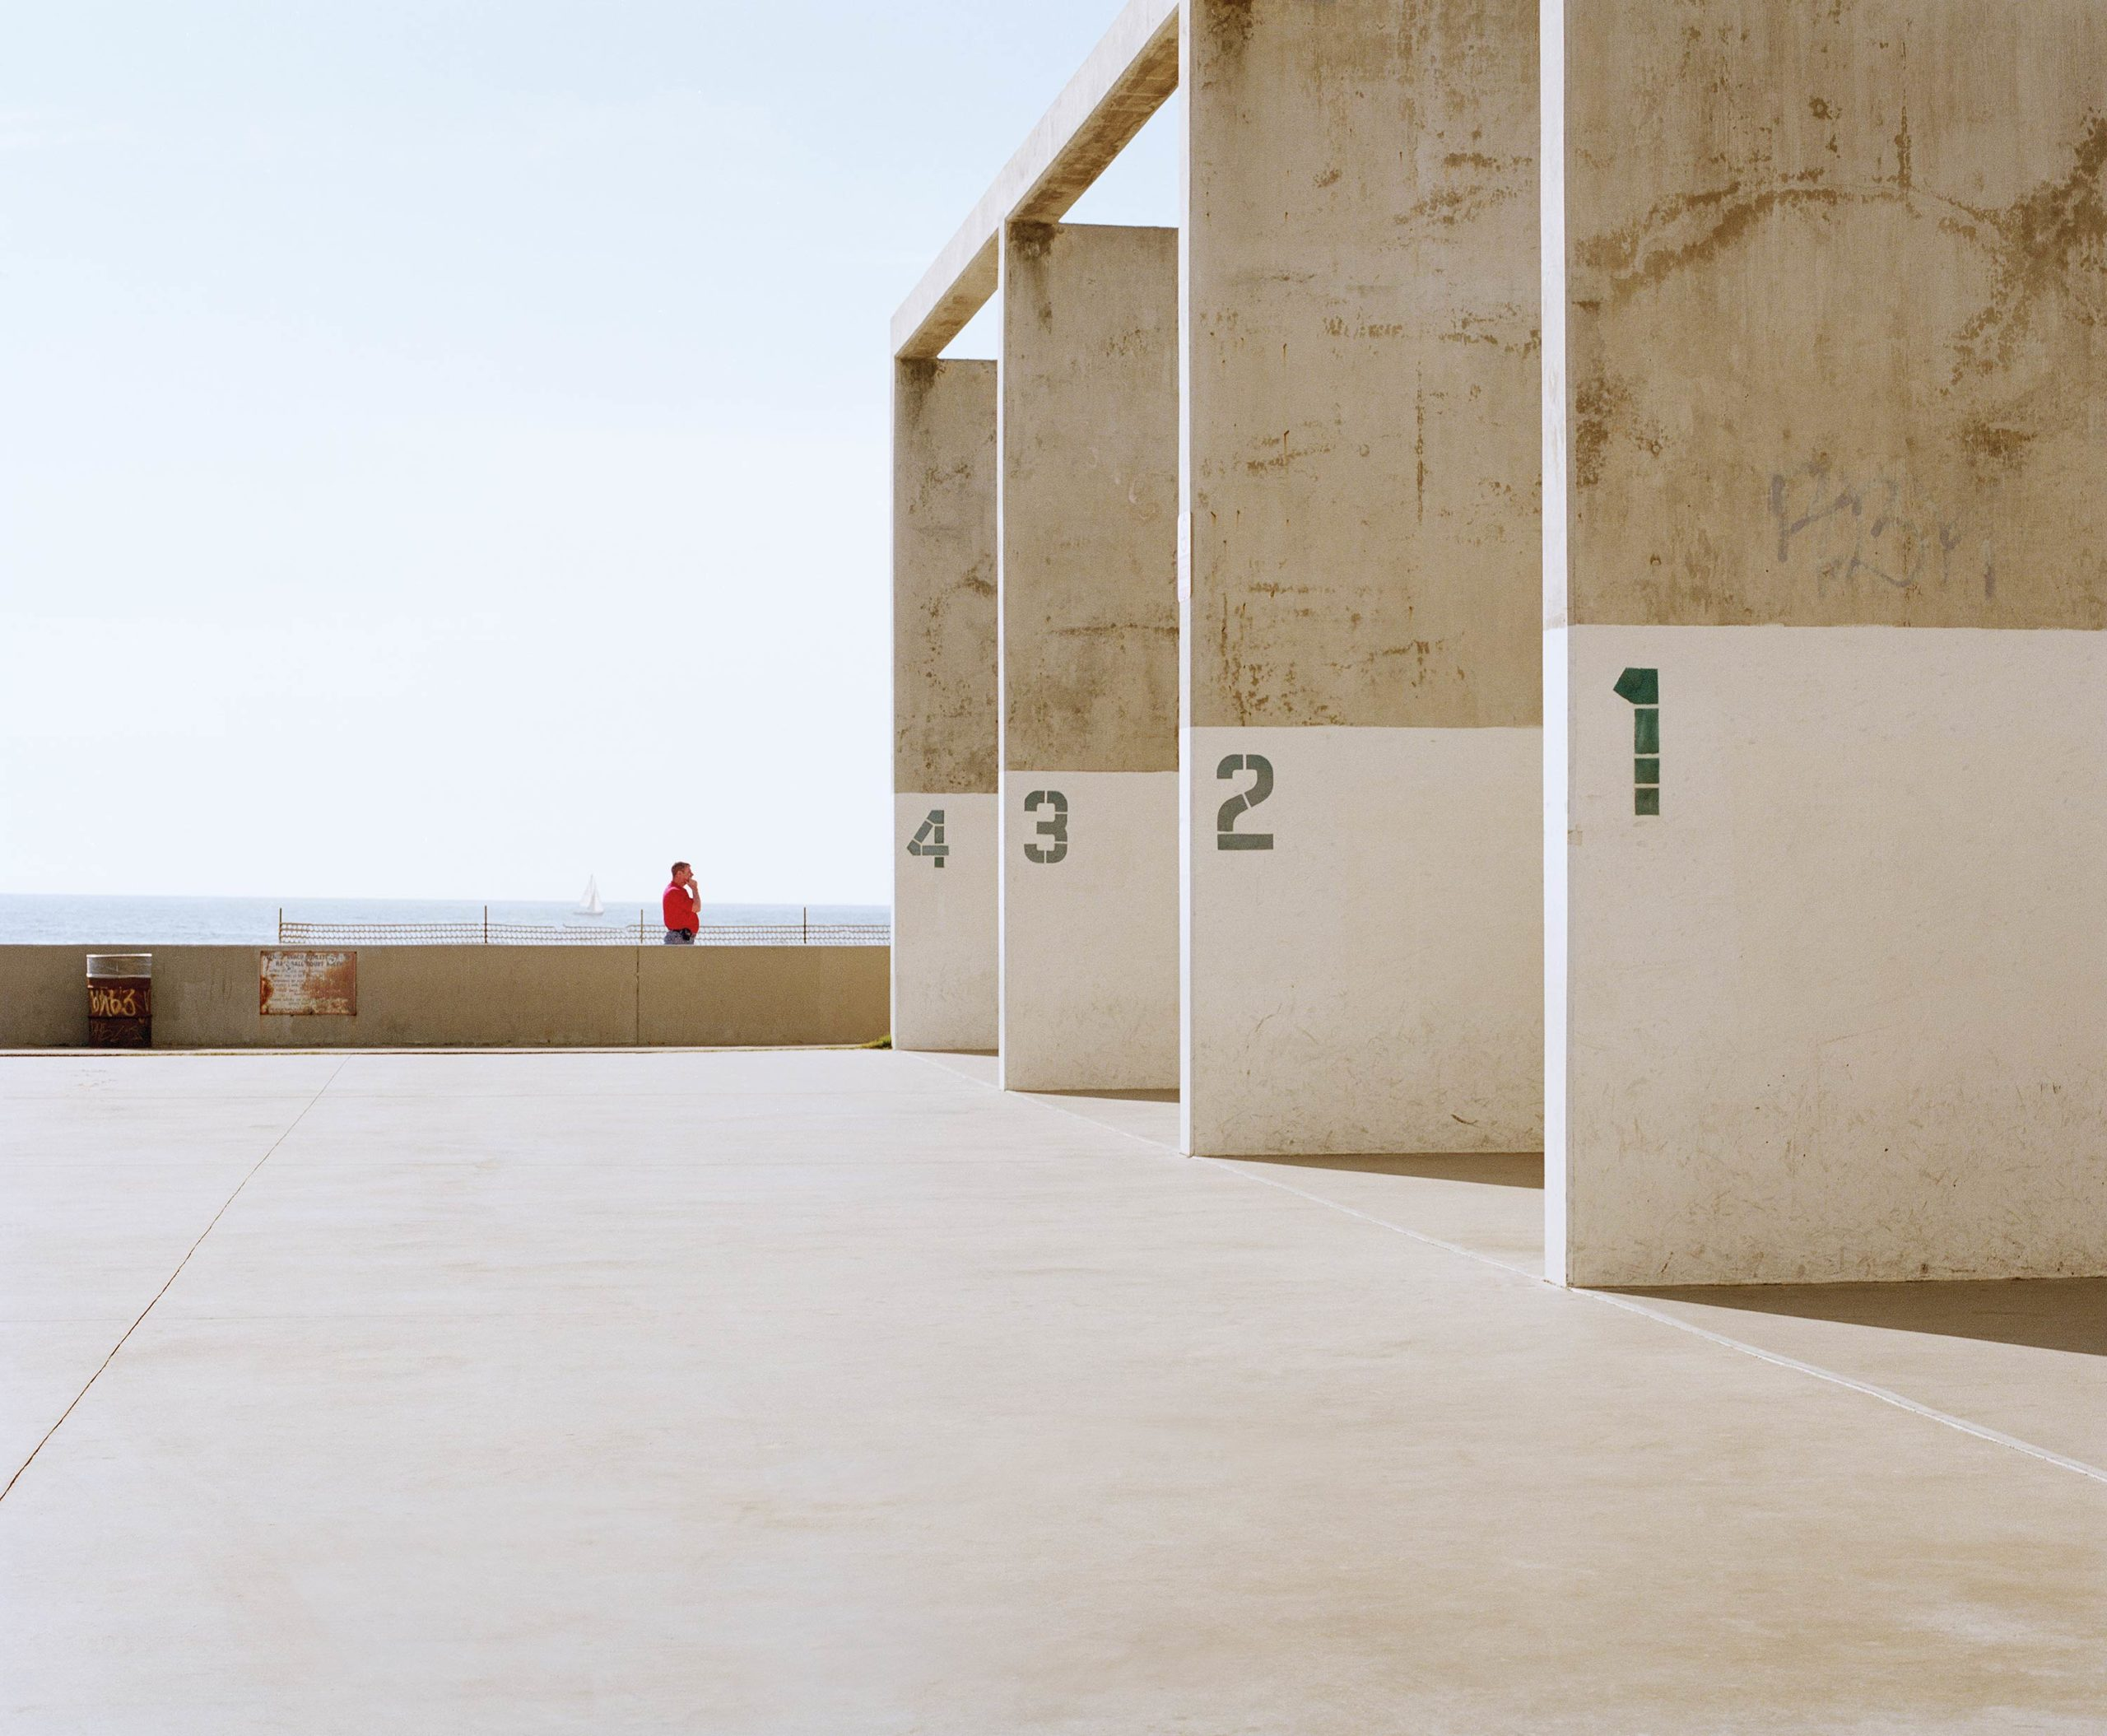 Venice Beach Squash Courts - Concrete Collection - Fine Art Photography by Toby Dixon